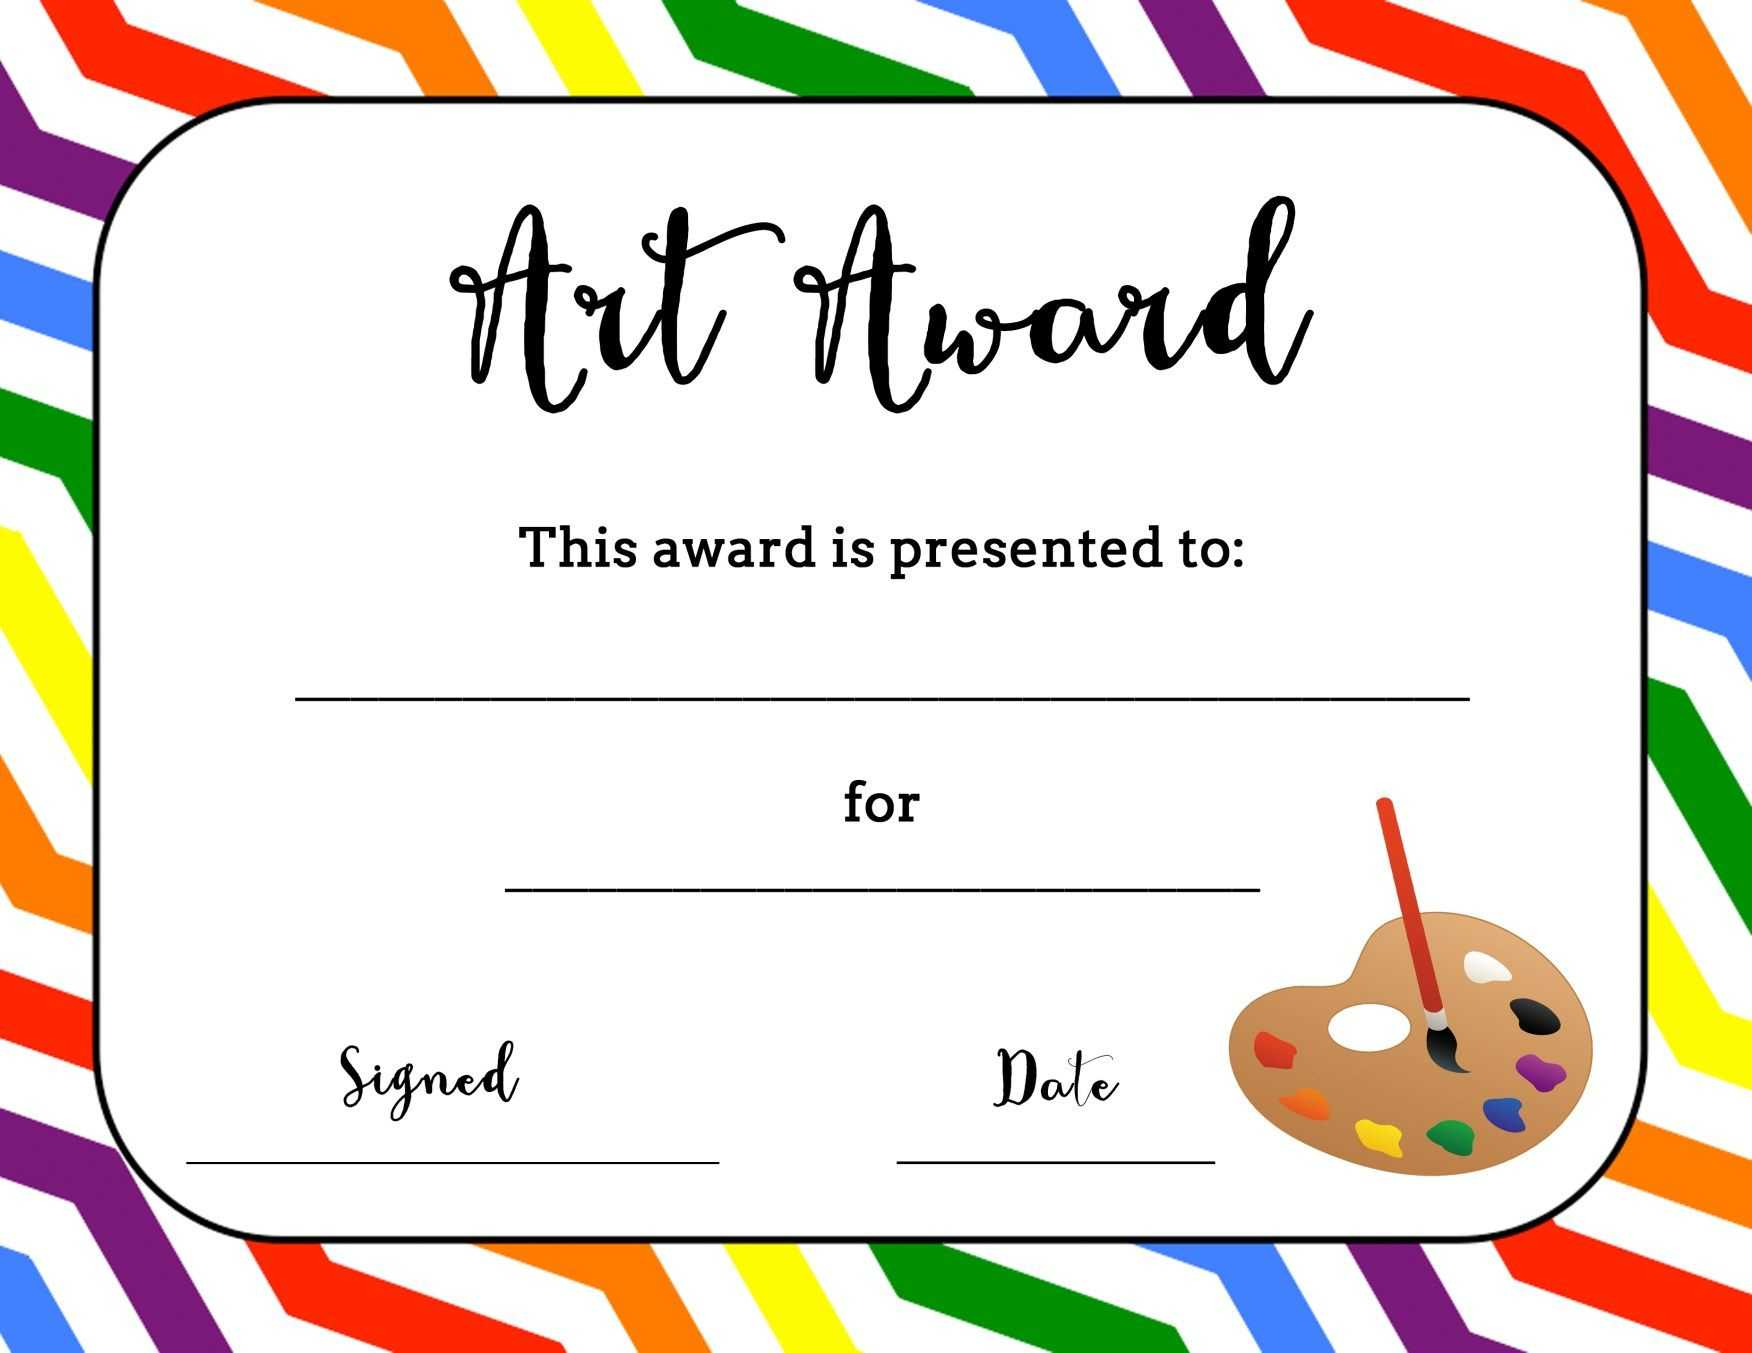 Art Award Certificate (Free Printable) | Art Classroom regarding Free Art Certificate Templates